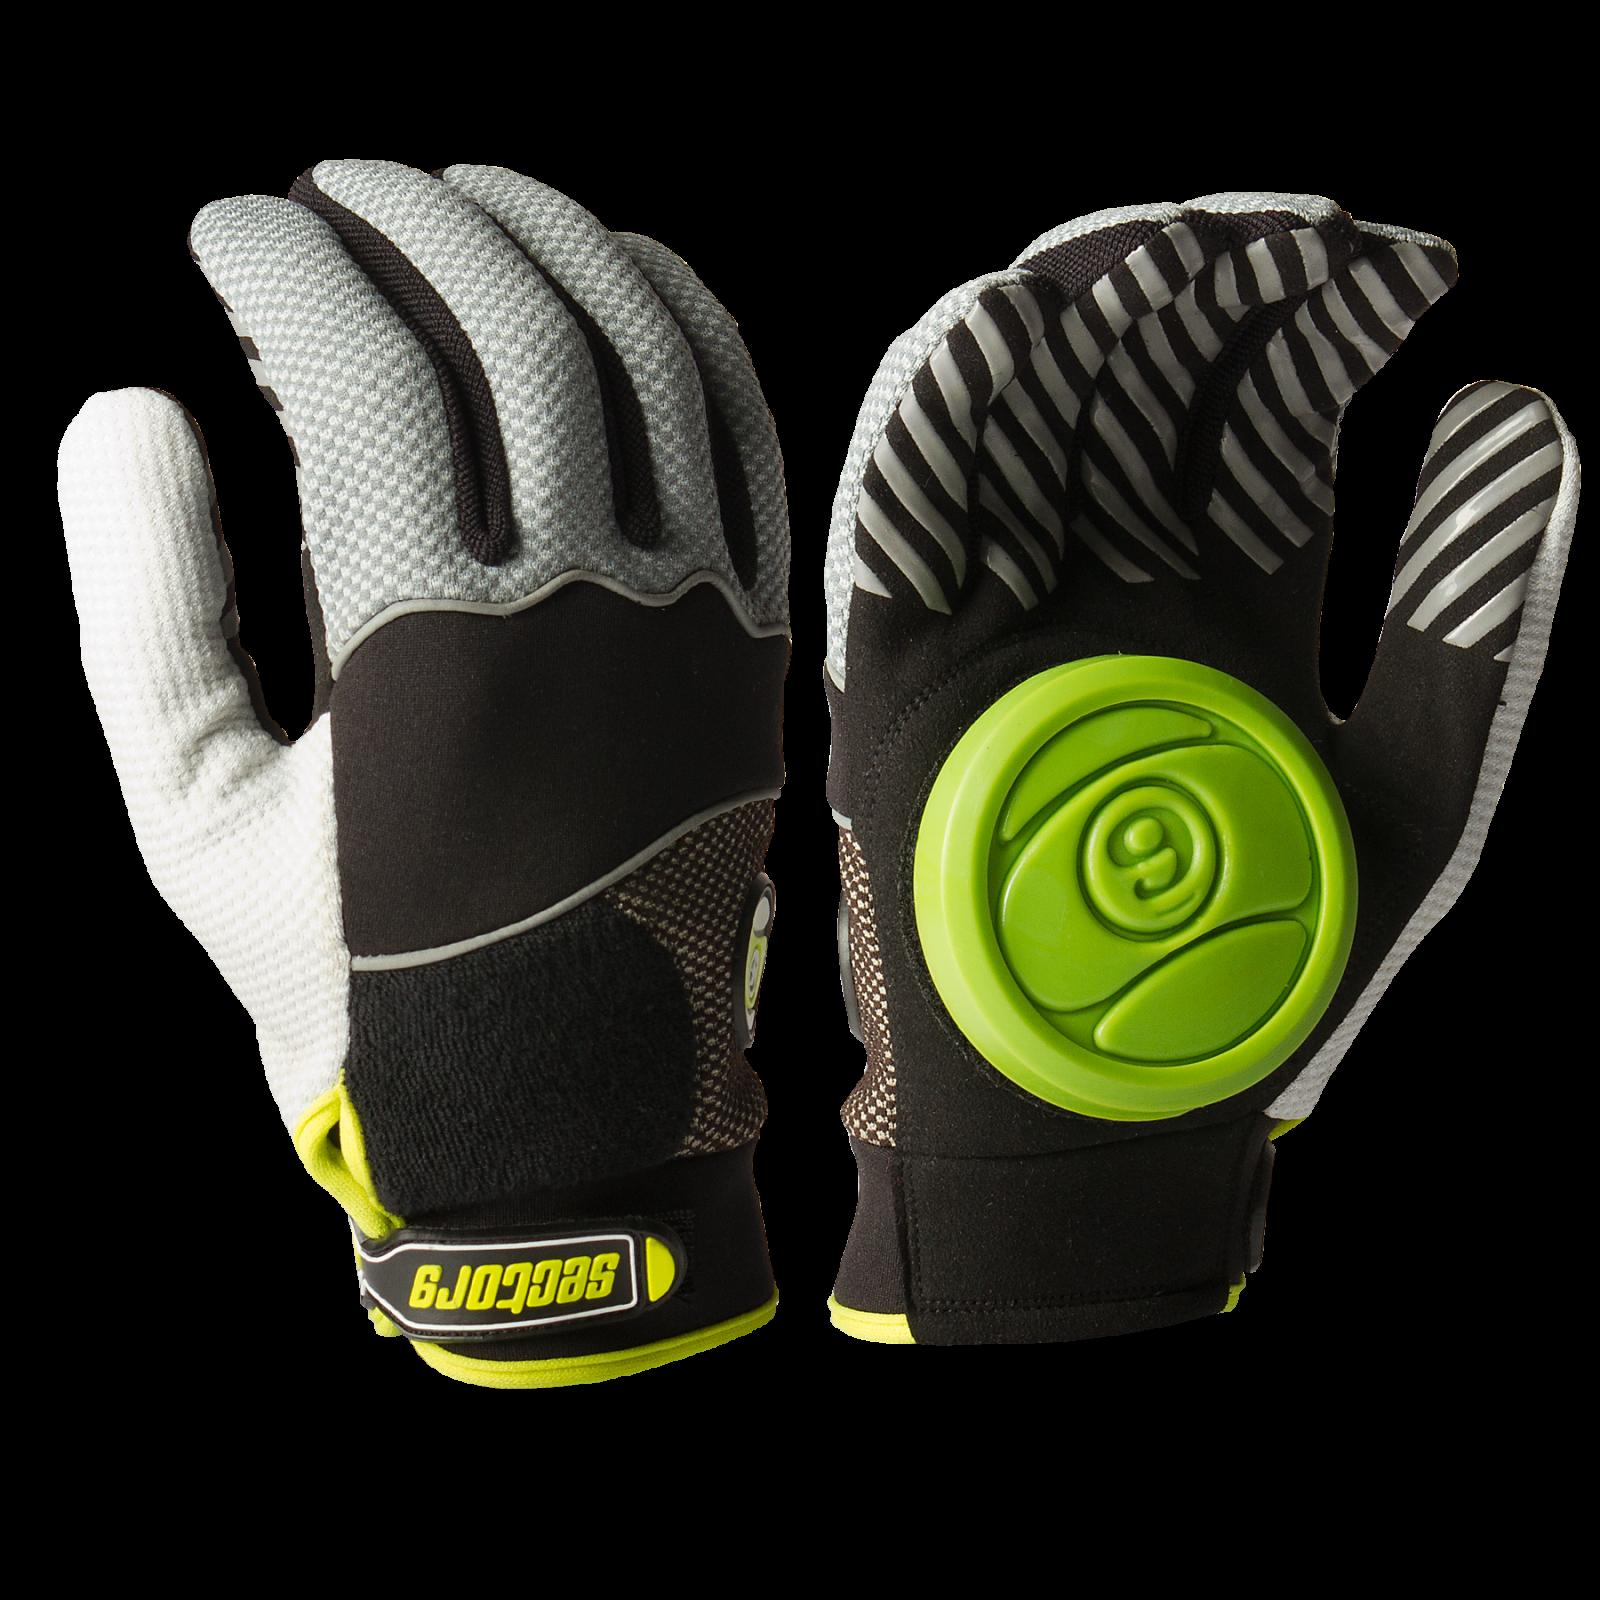 Sector 9 Apex Longboard Slide Glove